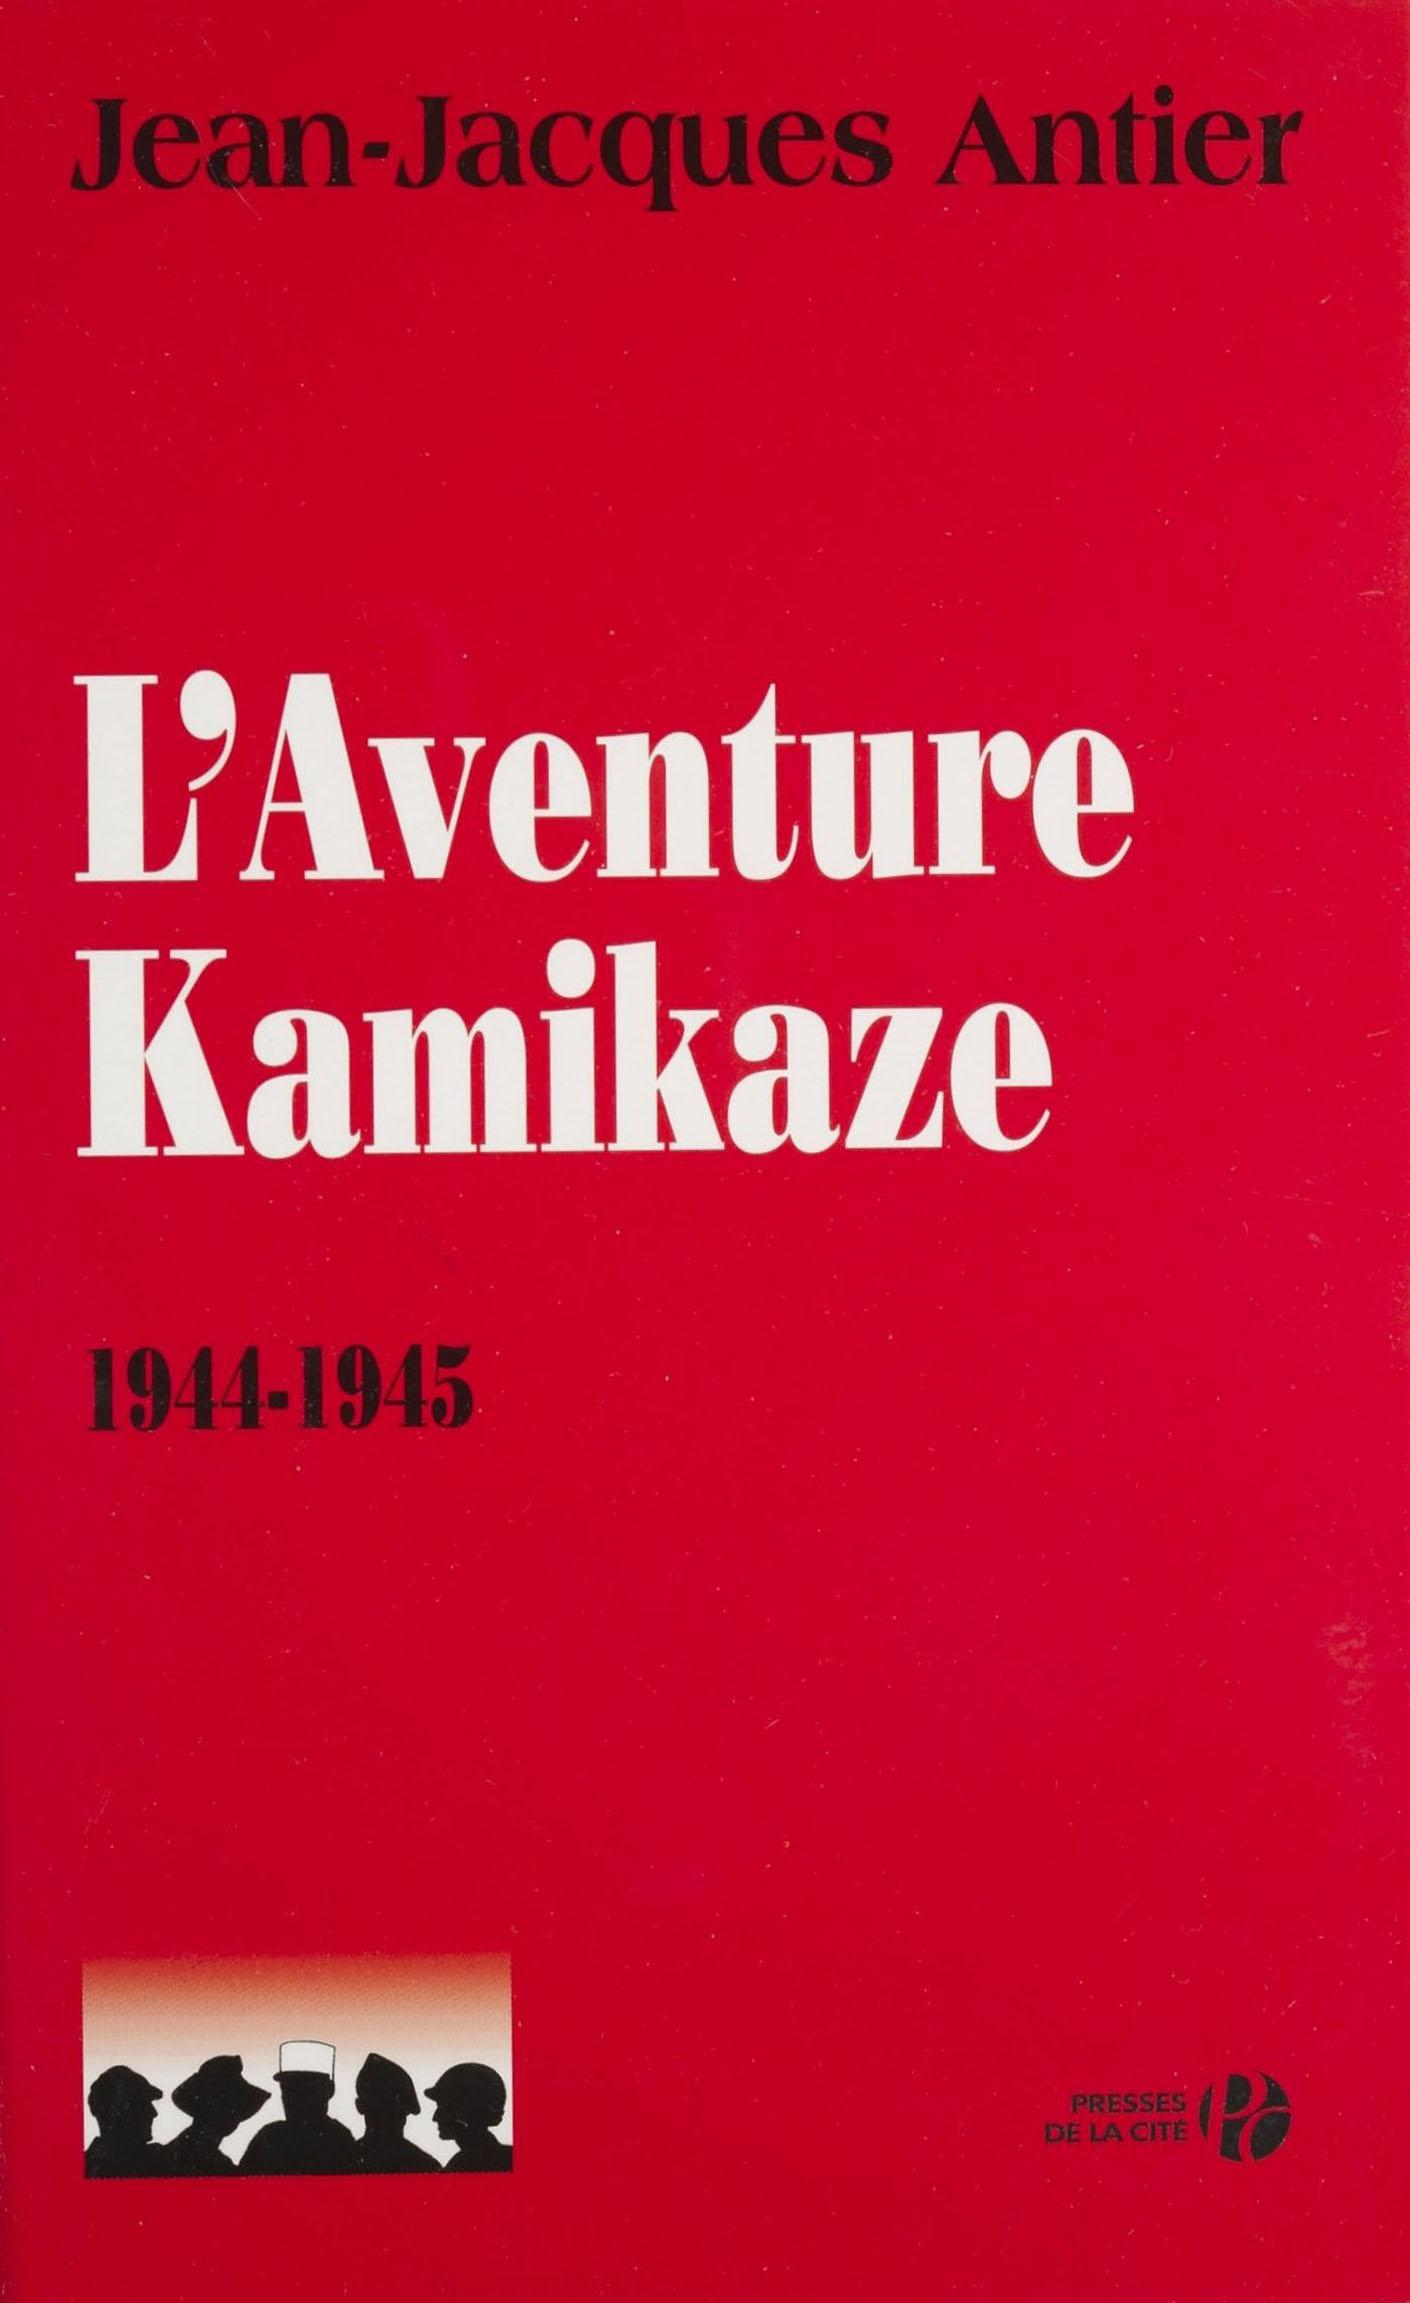 L'Aventure kamikaze (1944-1...